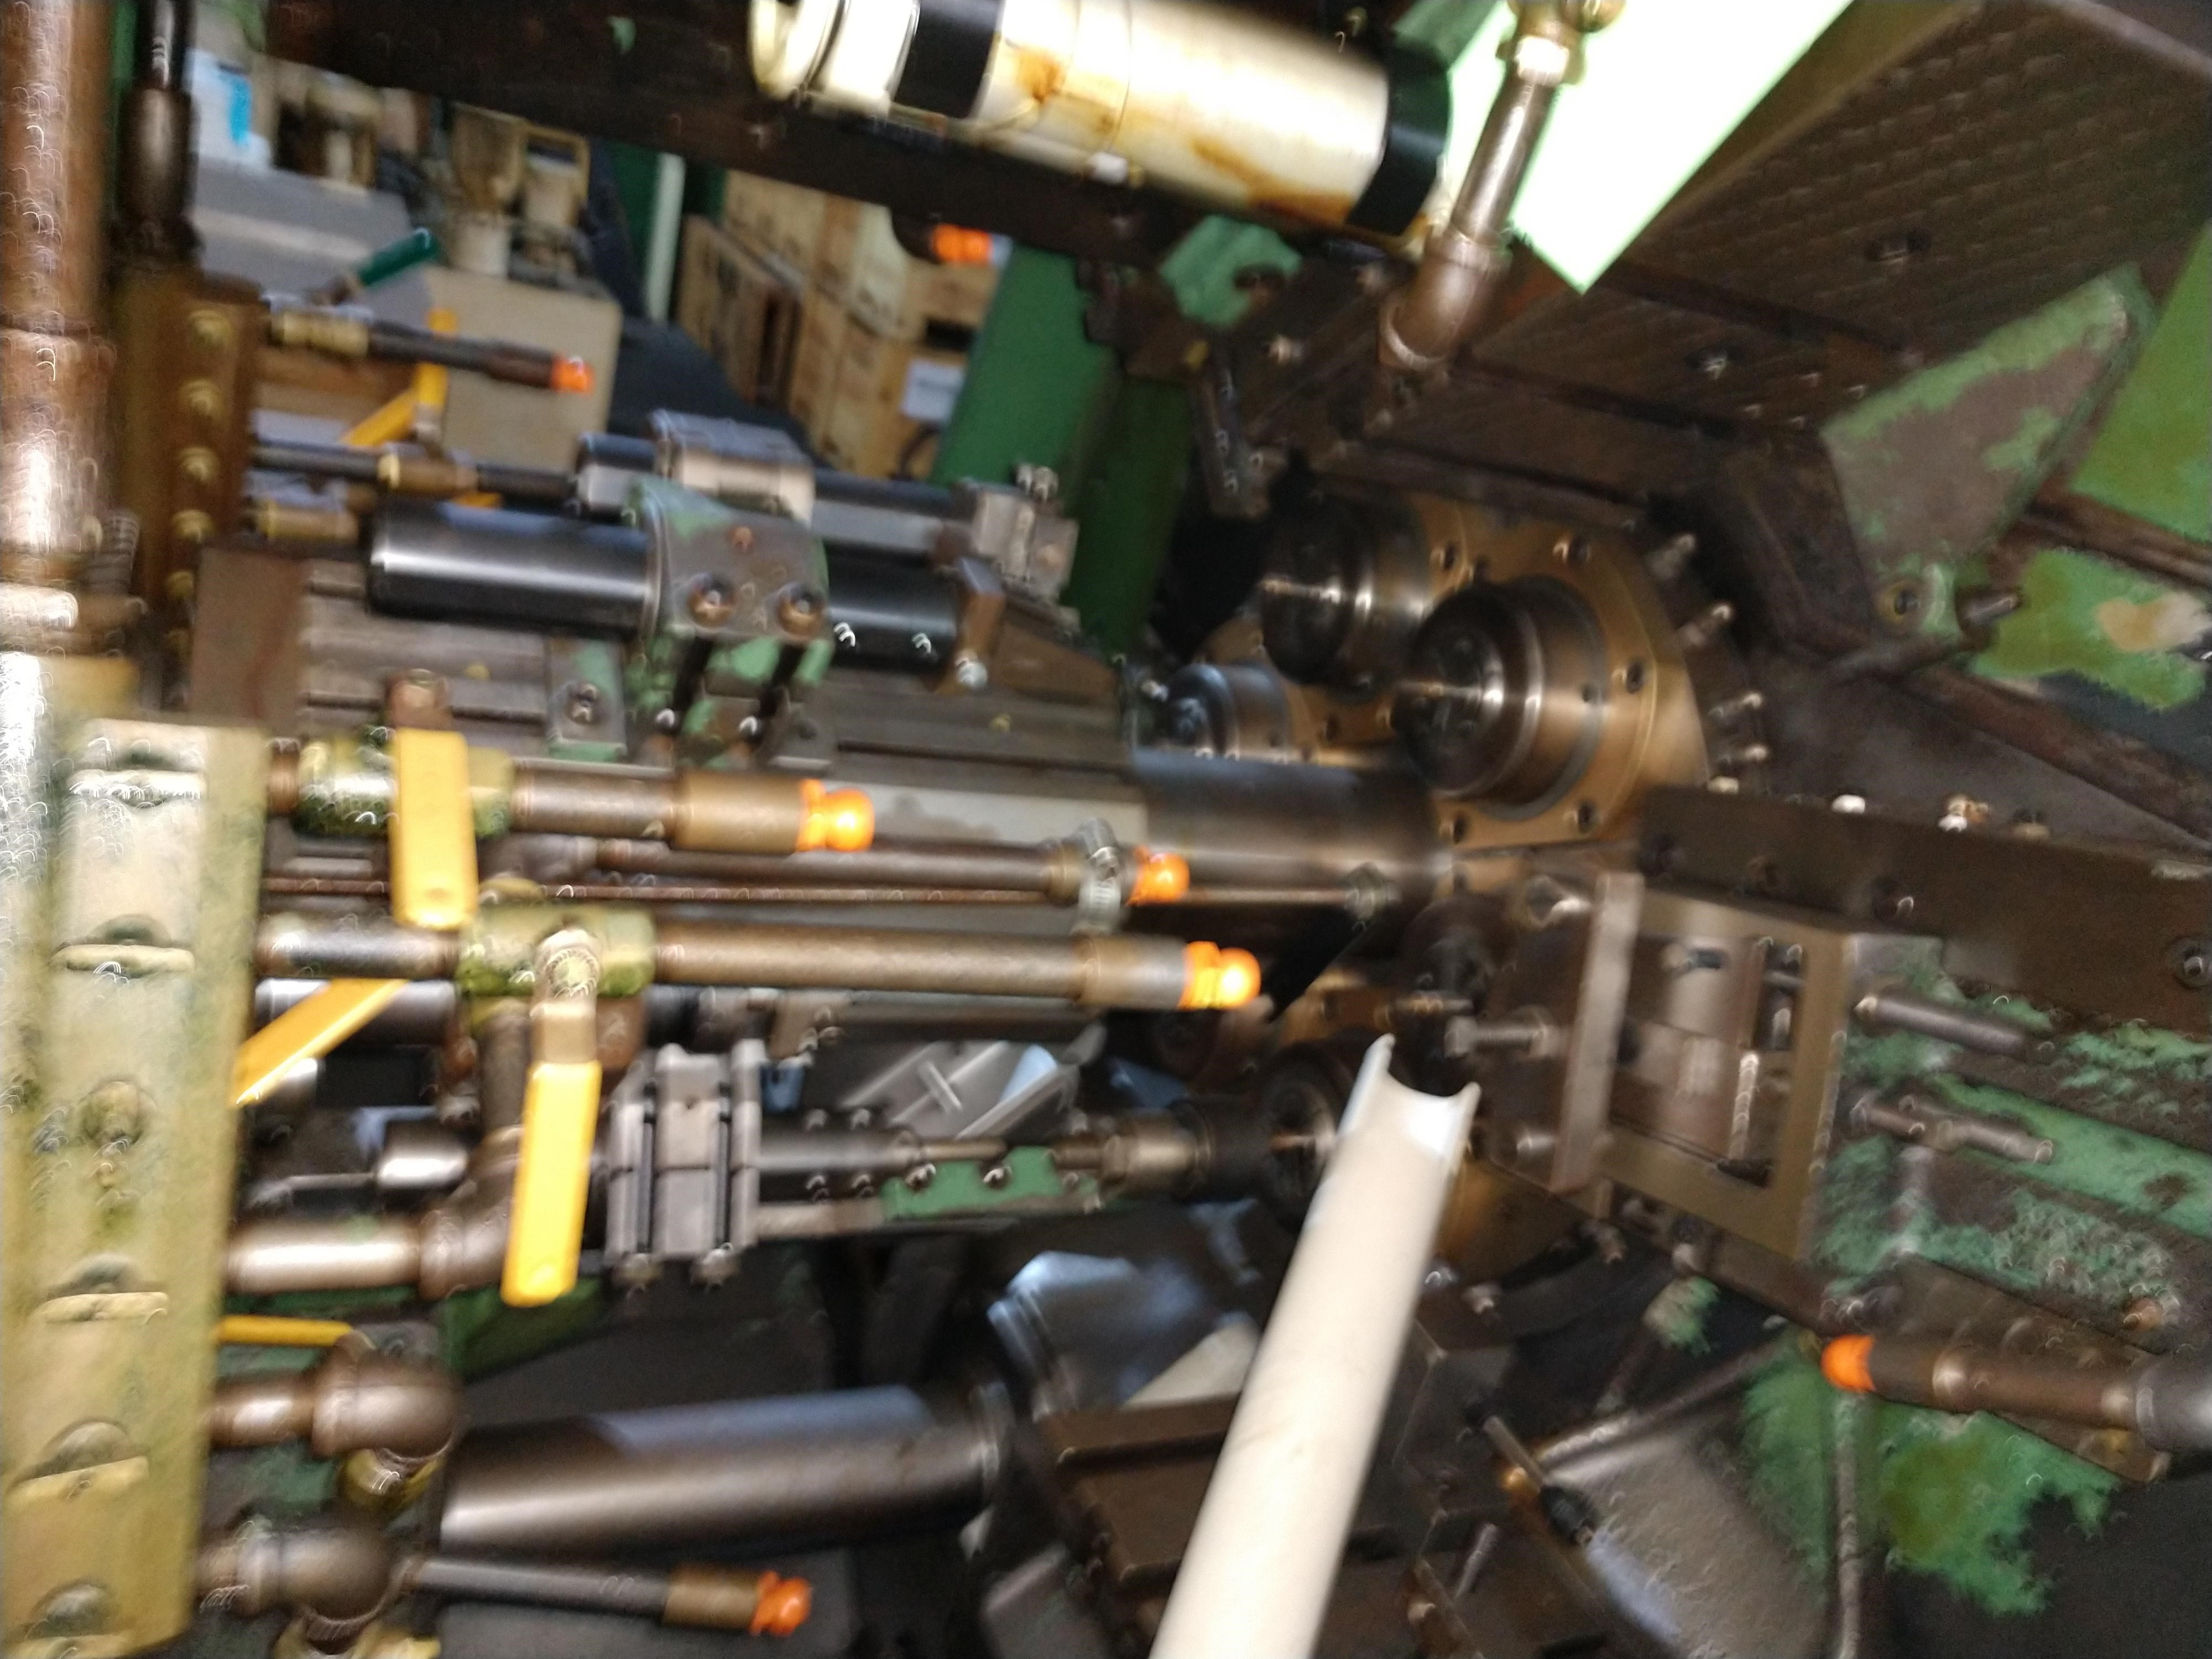 http://www.machinetools247.com/images/machines/16777-Acme-Gridley RB-6 f.jpg